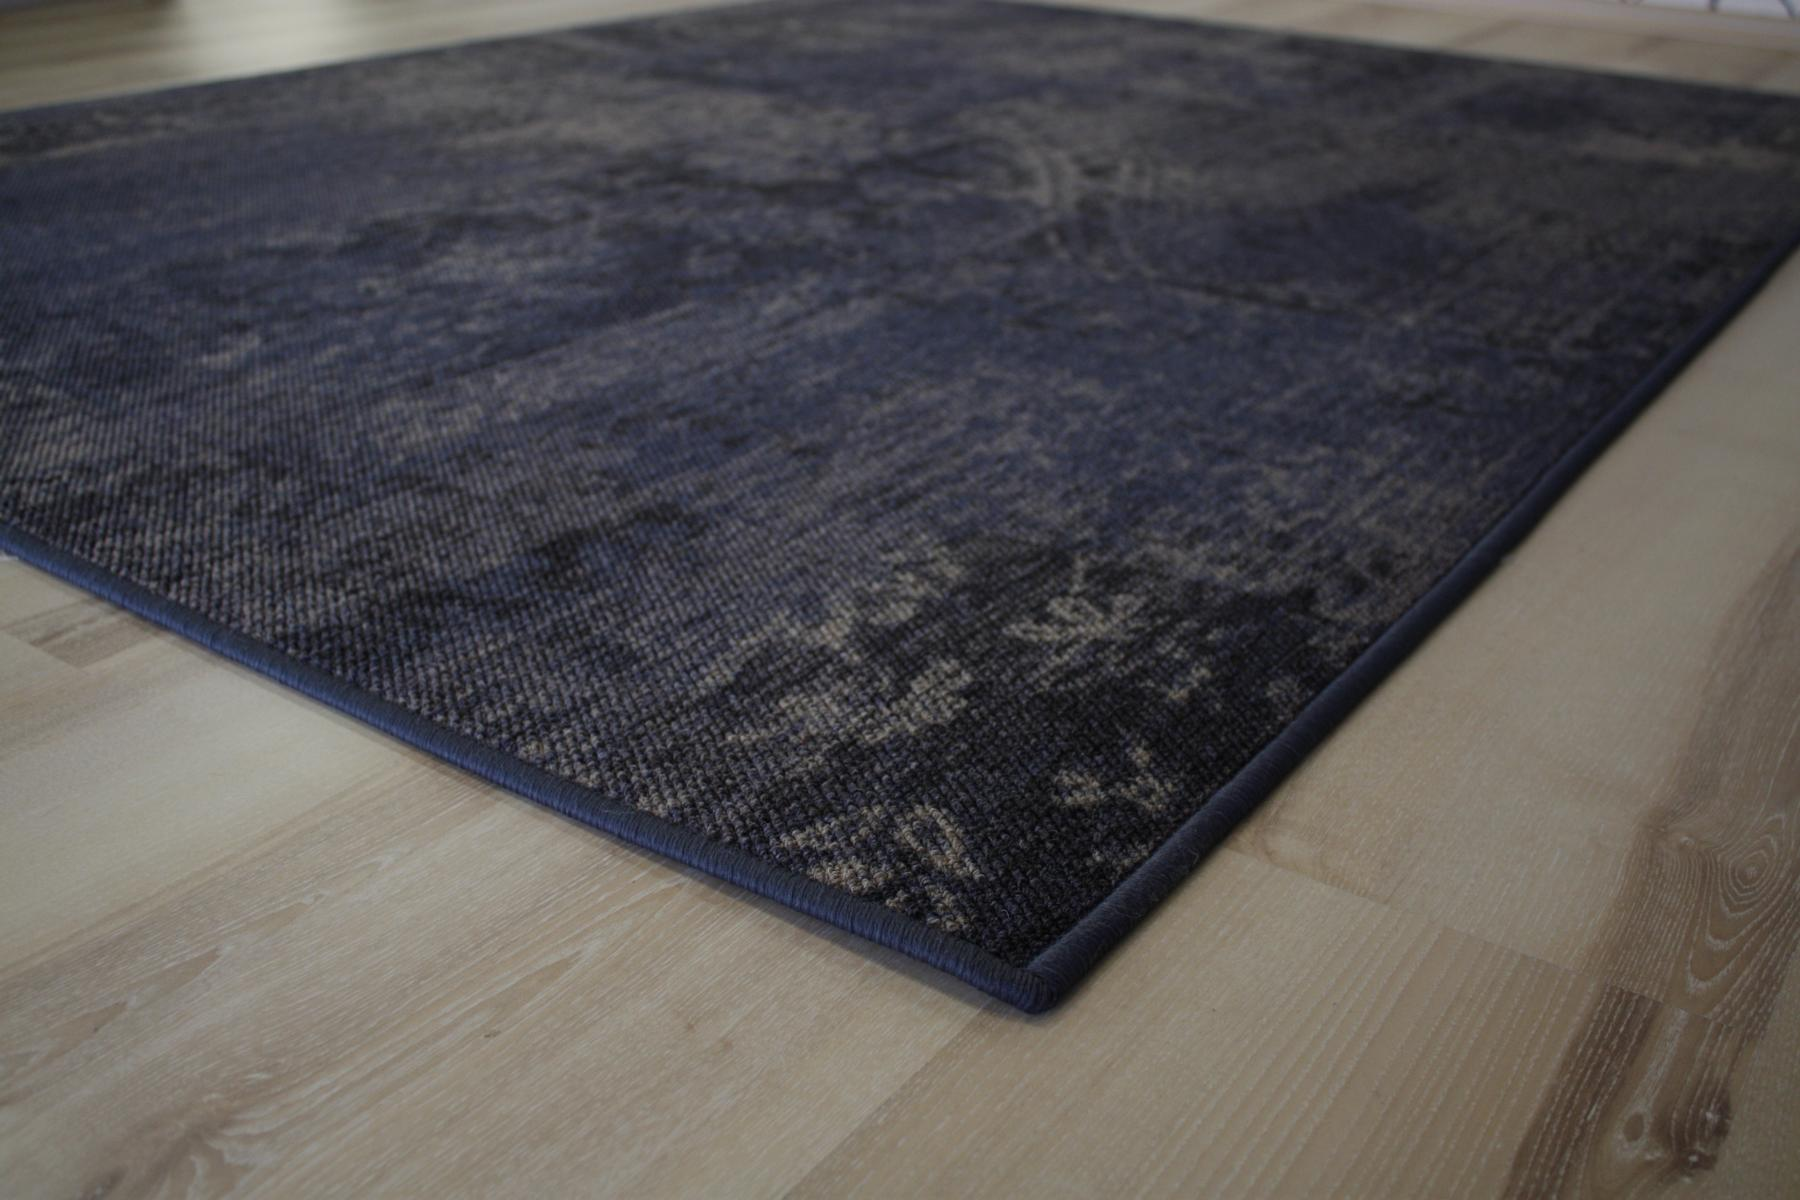 Tappeto patchwork pavimento tappeto blu 200x250 cm ebay - Tappeto riscaldamento pavimento ...